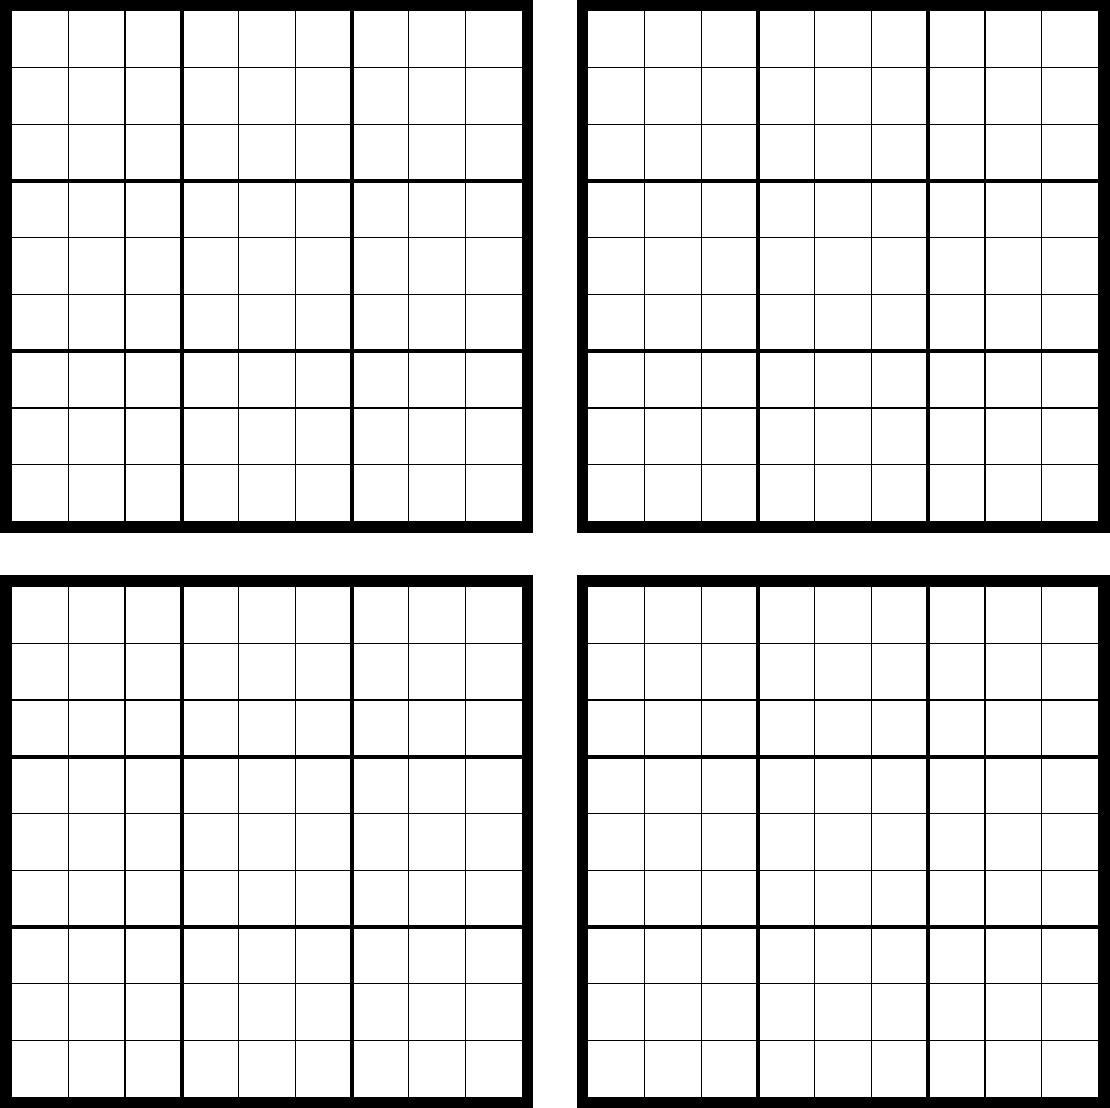 Sudoku Blank | Print Calendar, Sudoku, Dying My Hair